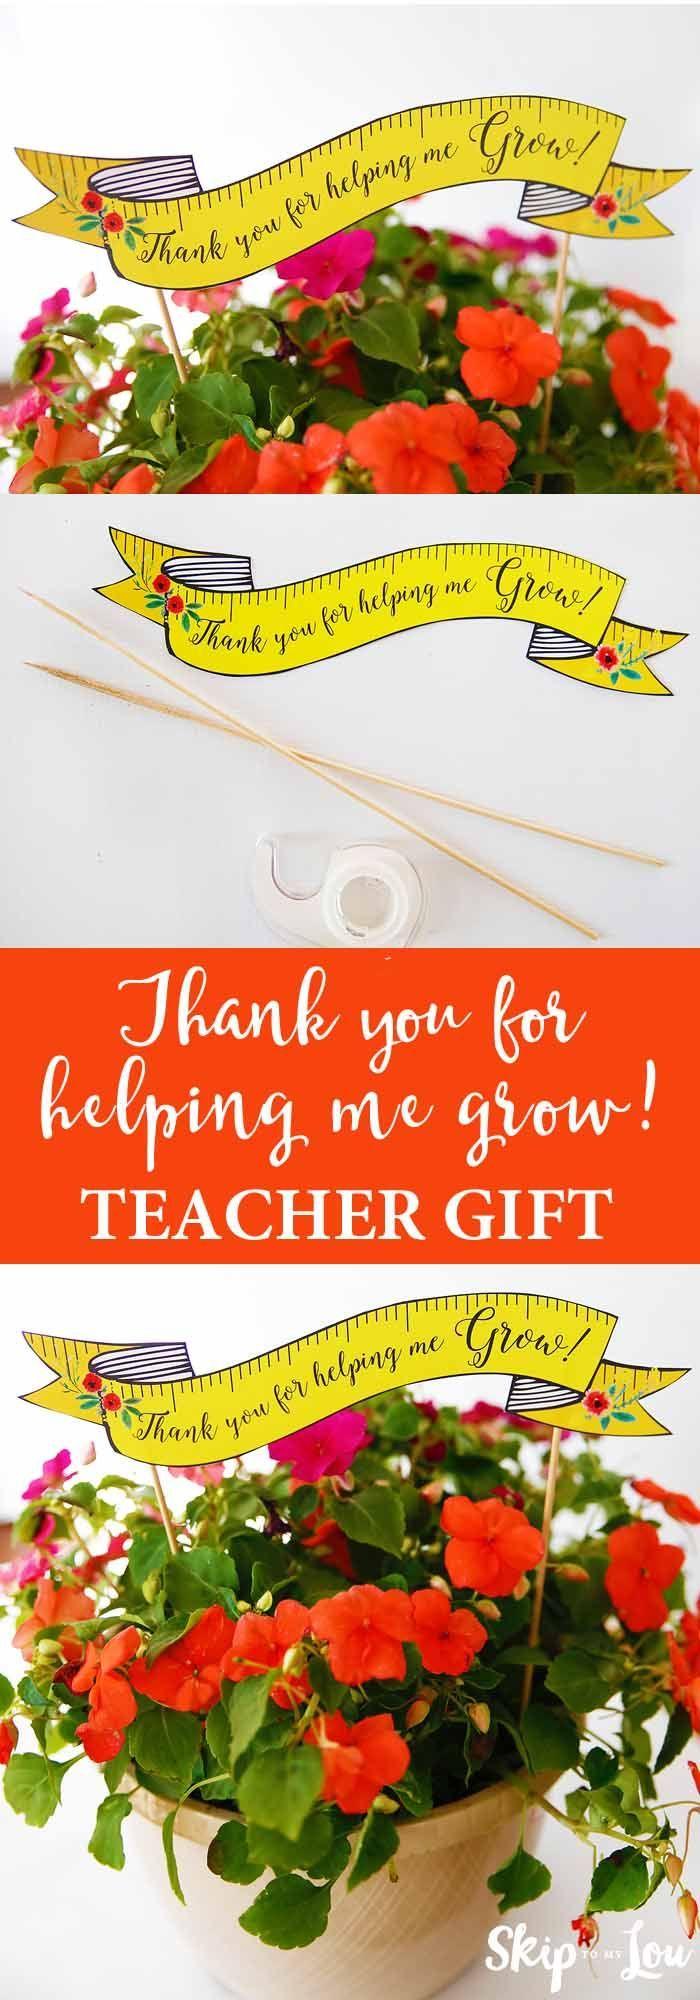 Teacher appreciation gift idea! Free printable